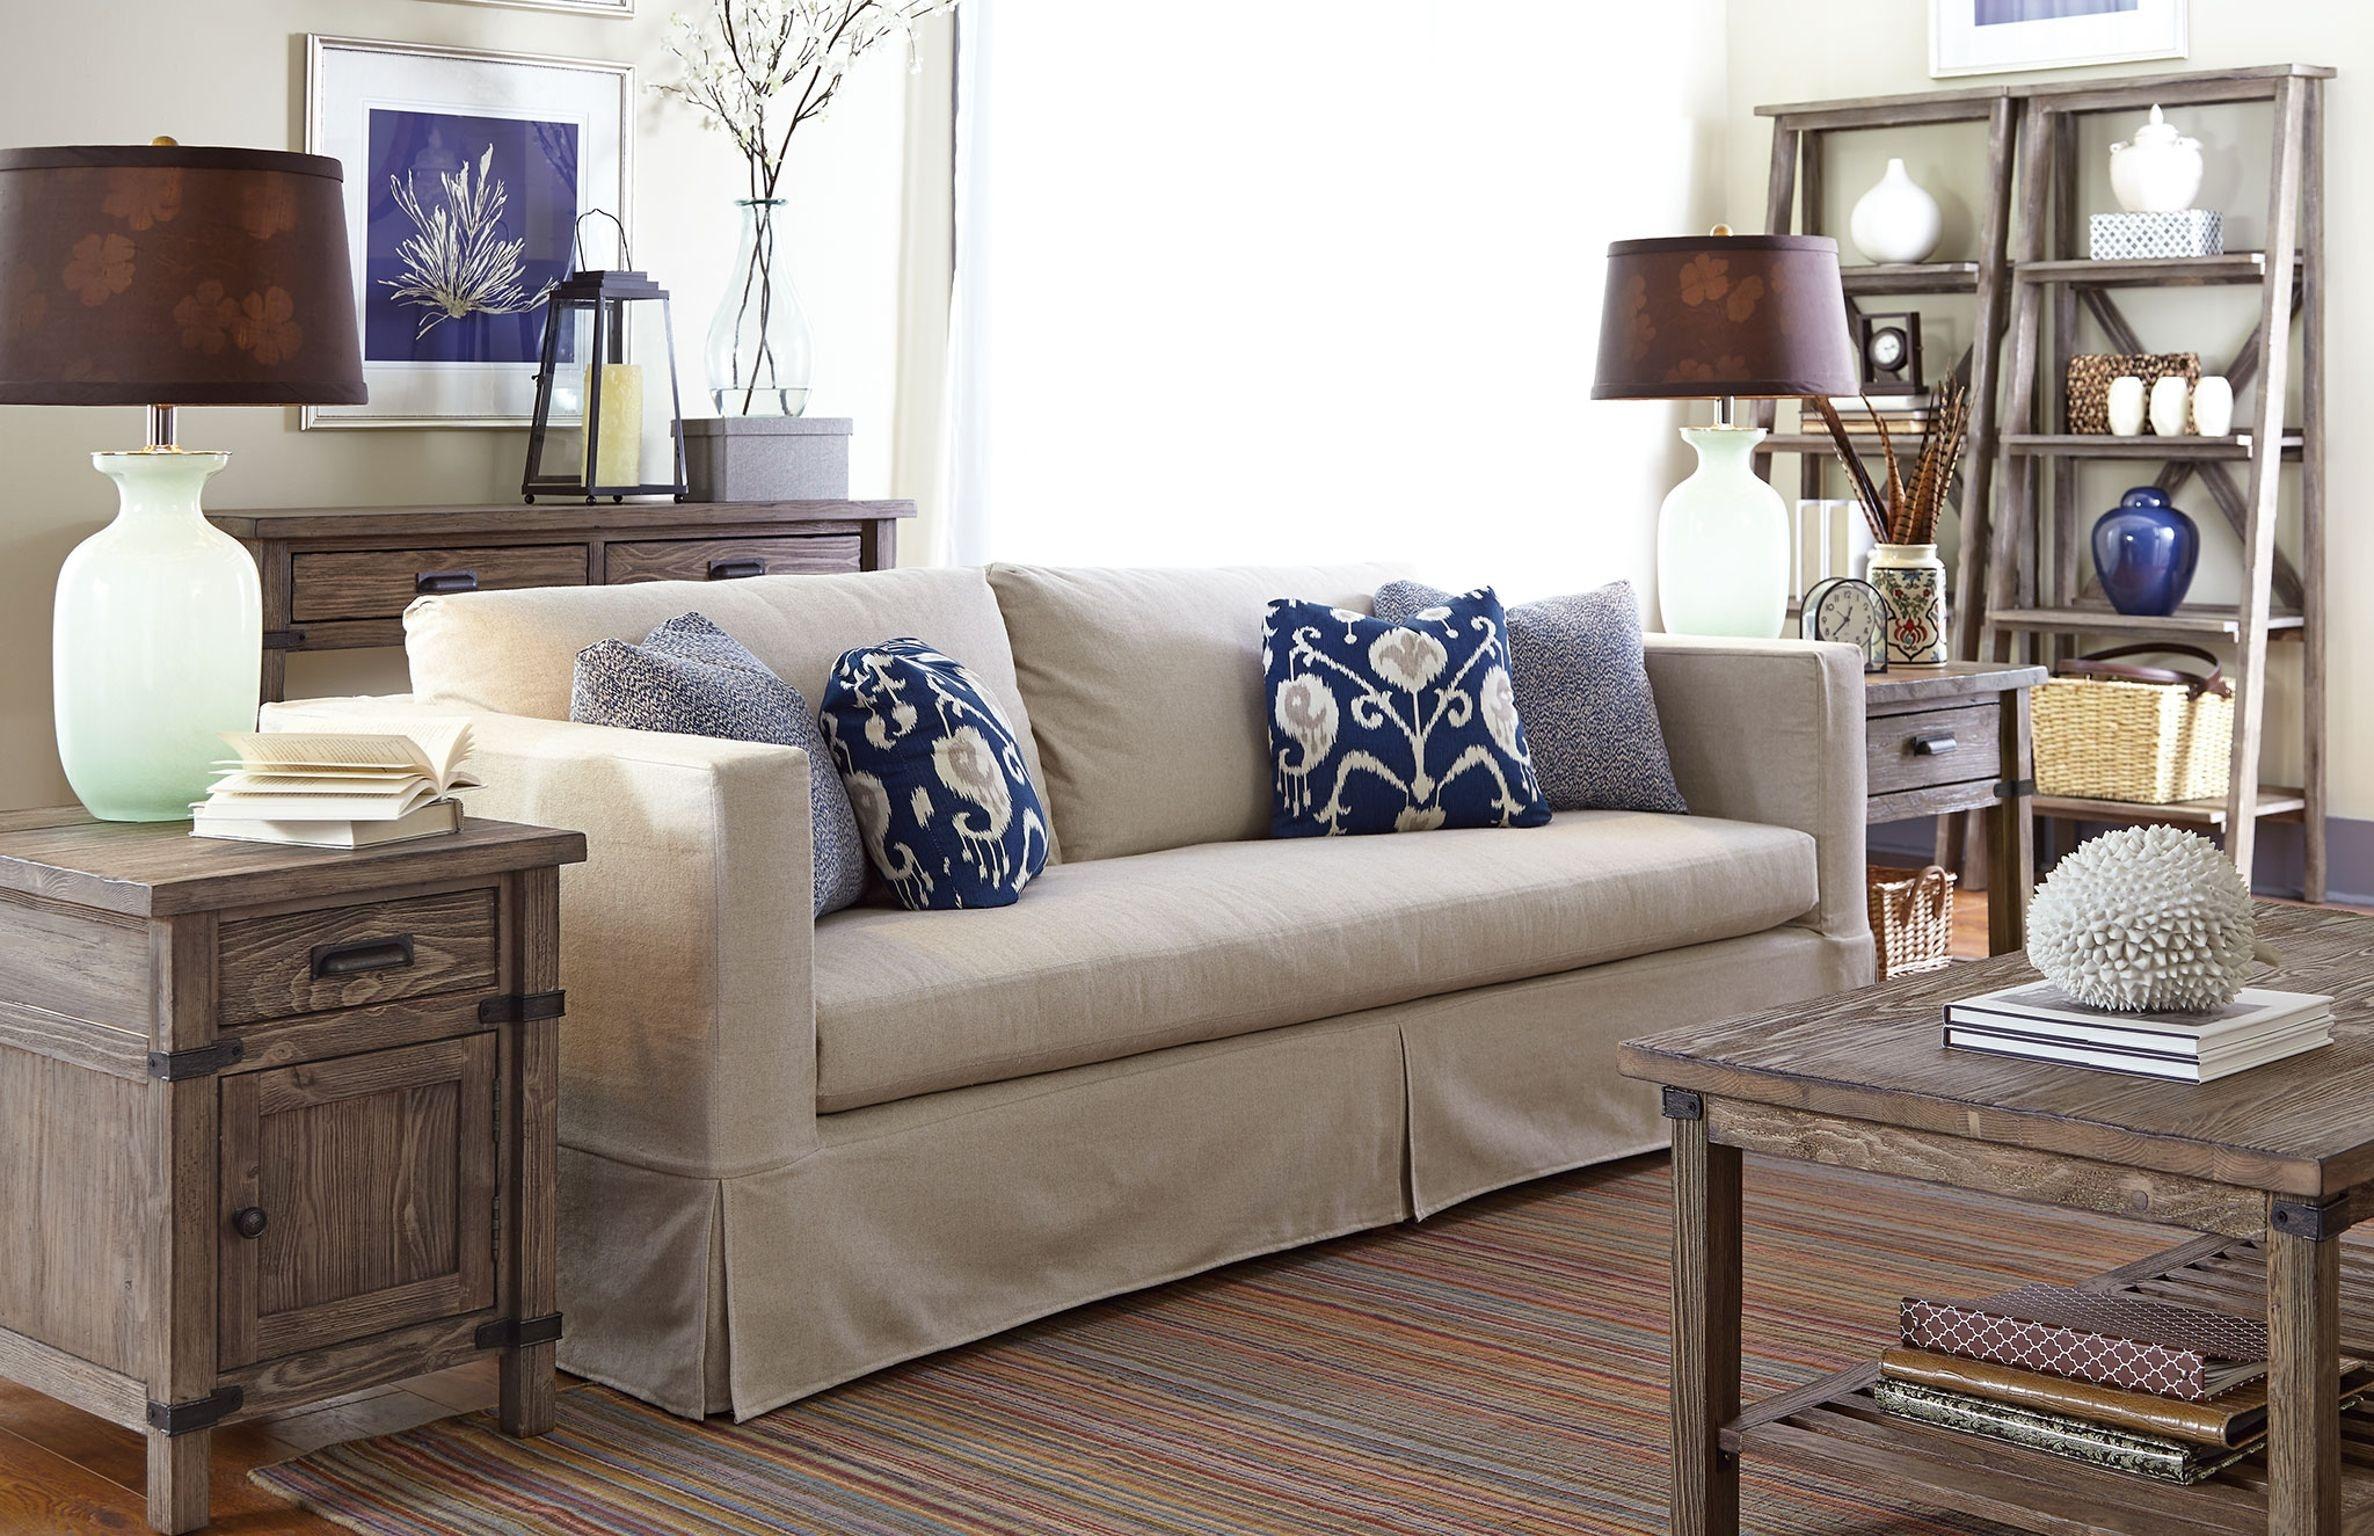 Living Room Furniture North Carolina kincaid furniture living room chairside table 59-026 - carolina